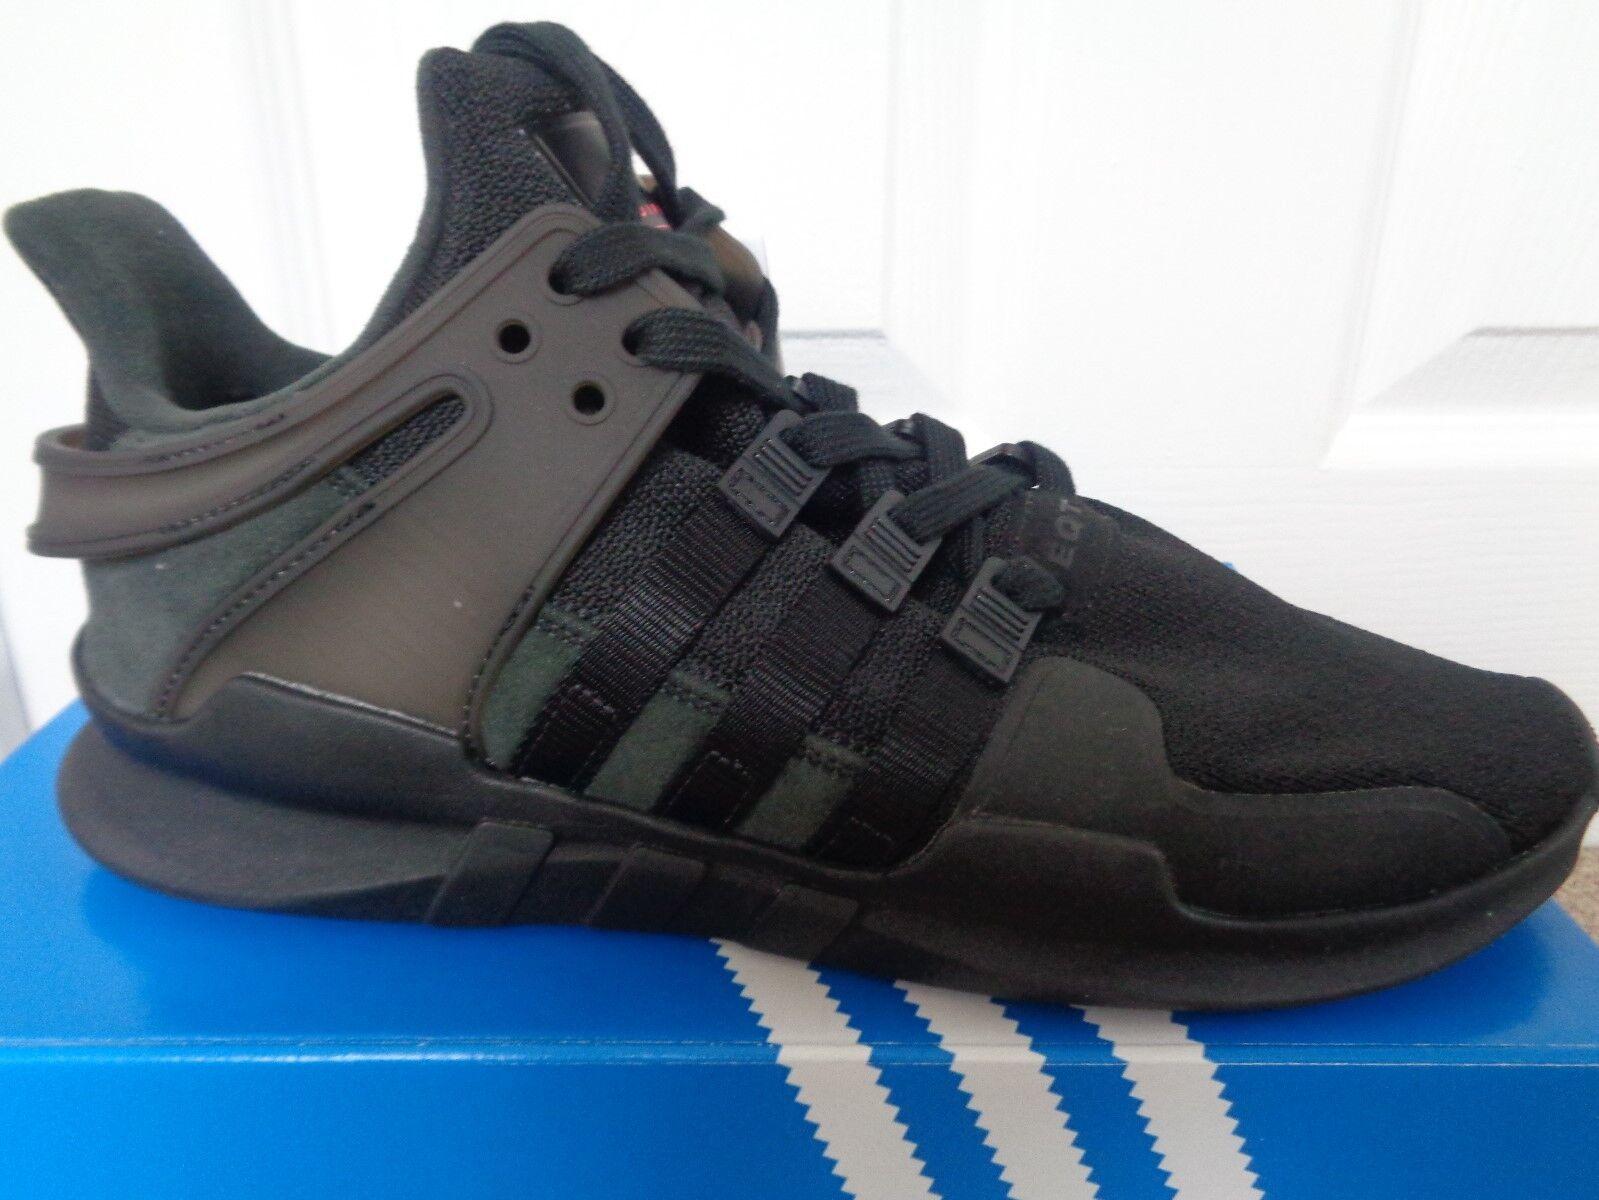 Adidas EQT Support ADV trainers sneakers BB1304 eu 42 2/3 us 9 NEW+BOX